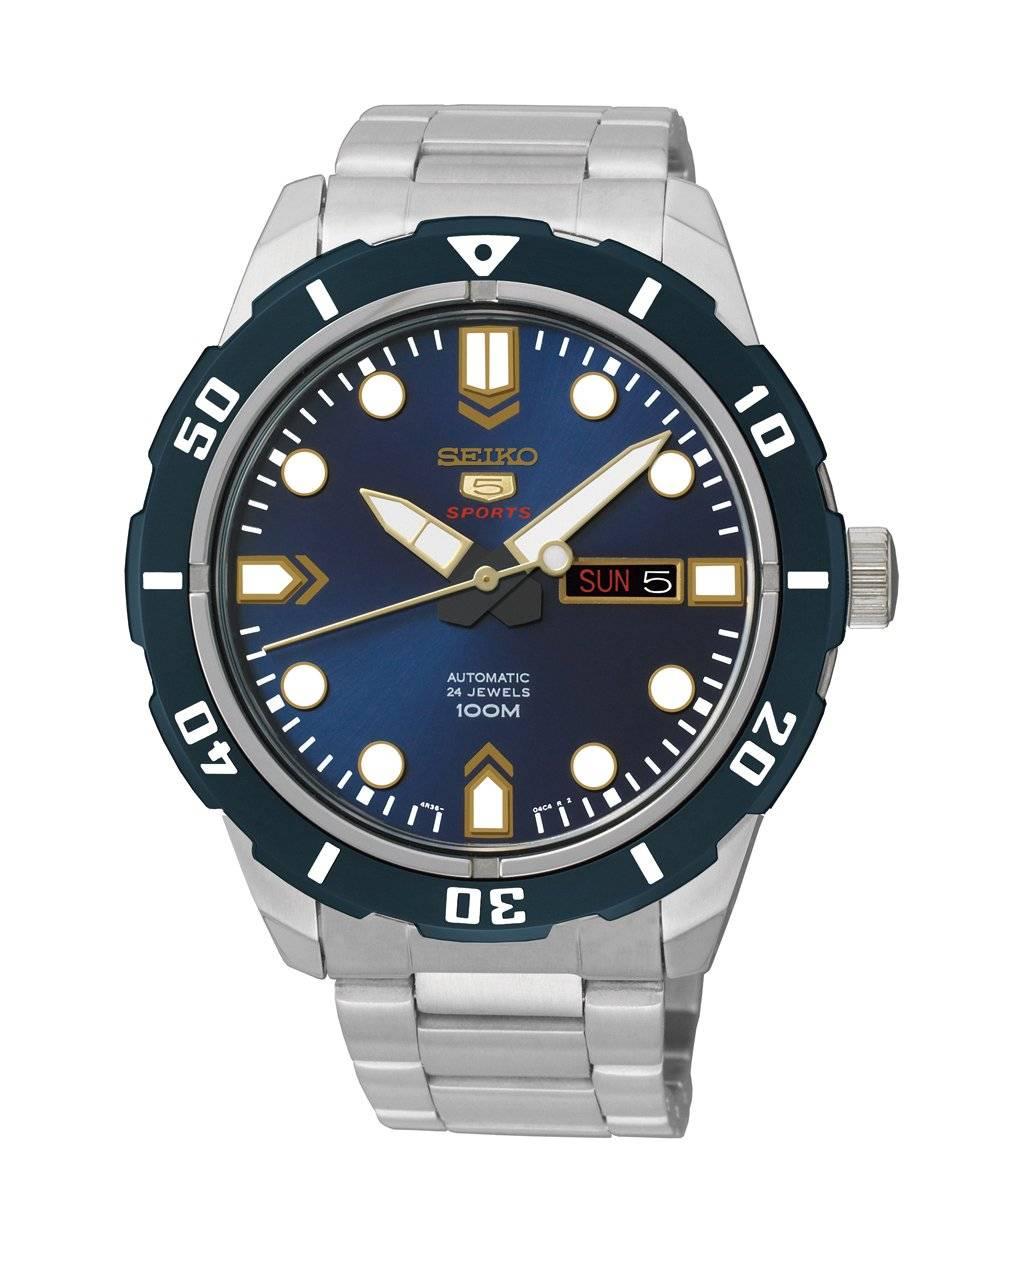 Relógio Seiko 5 Sports Masculino Automático SRP677B1 D1SX